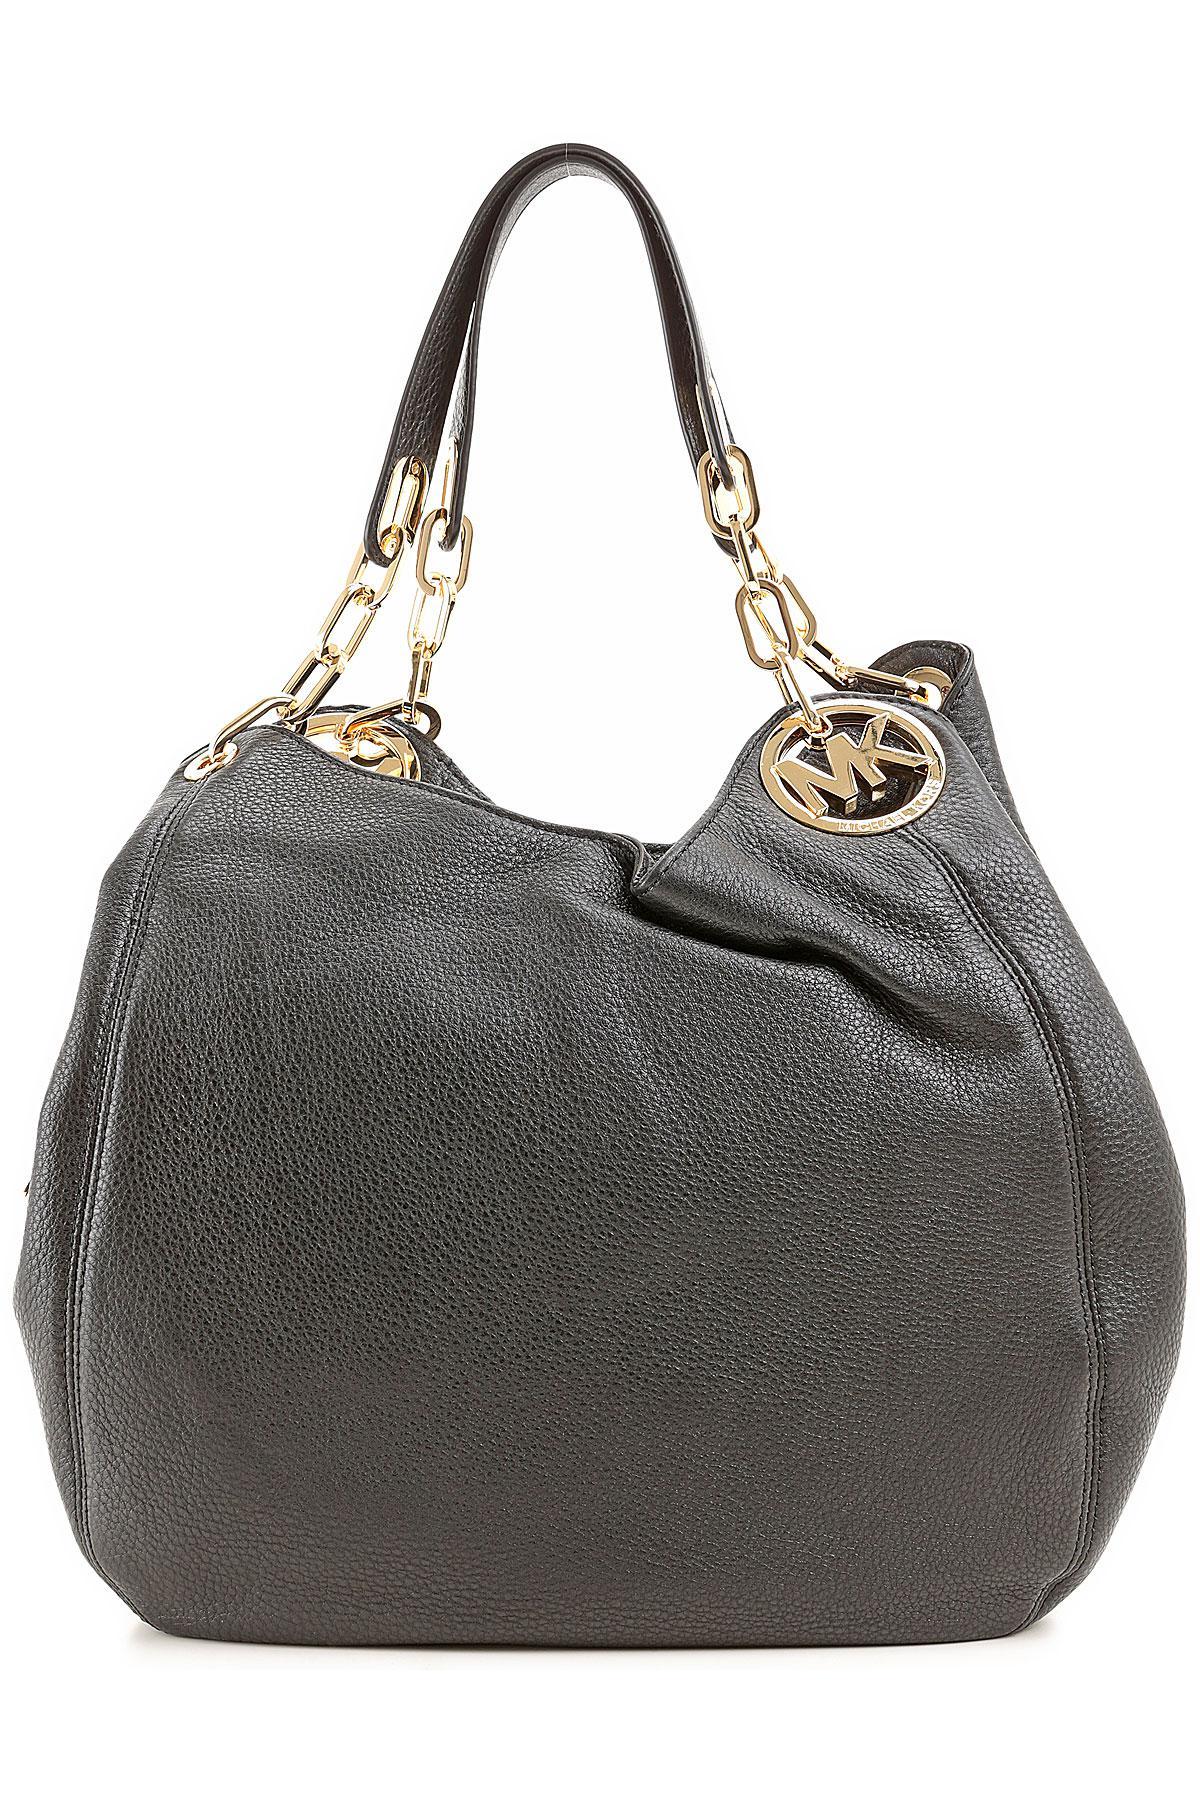 Lyst michael kors handbags on sale in black jpg 1200x1800 Michael purses on  sale 4c6aae61c9857